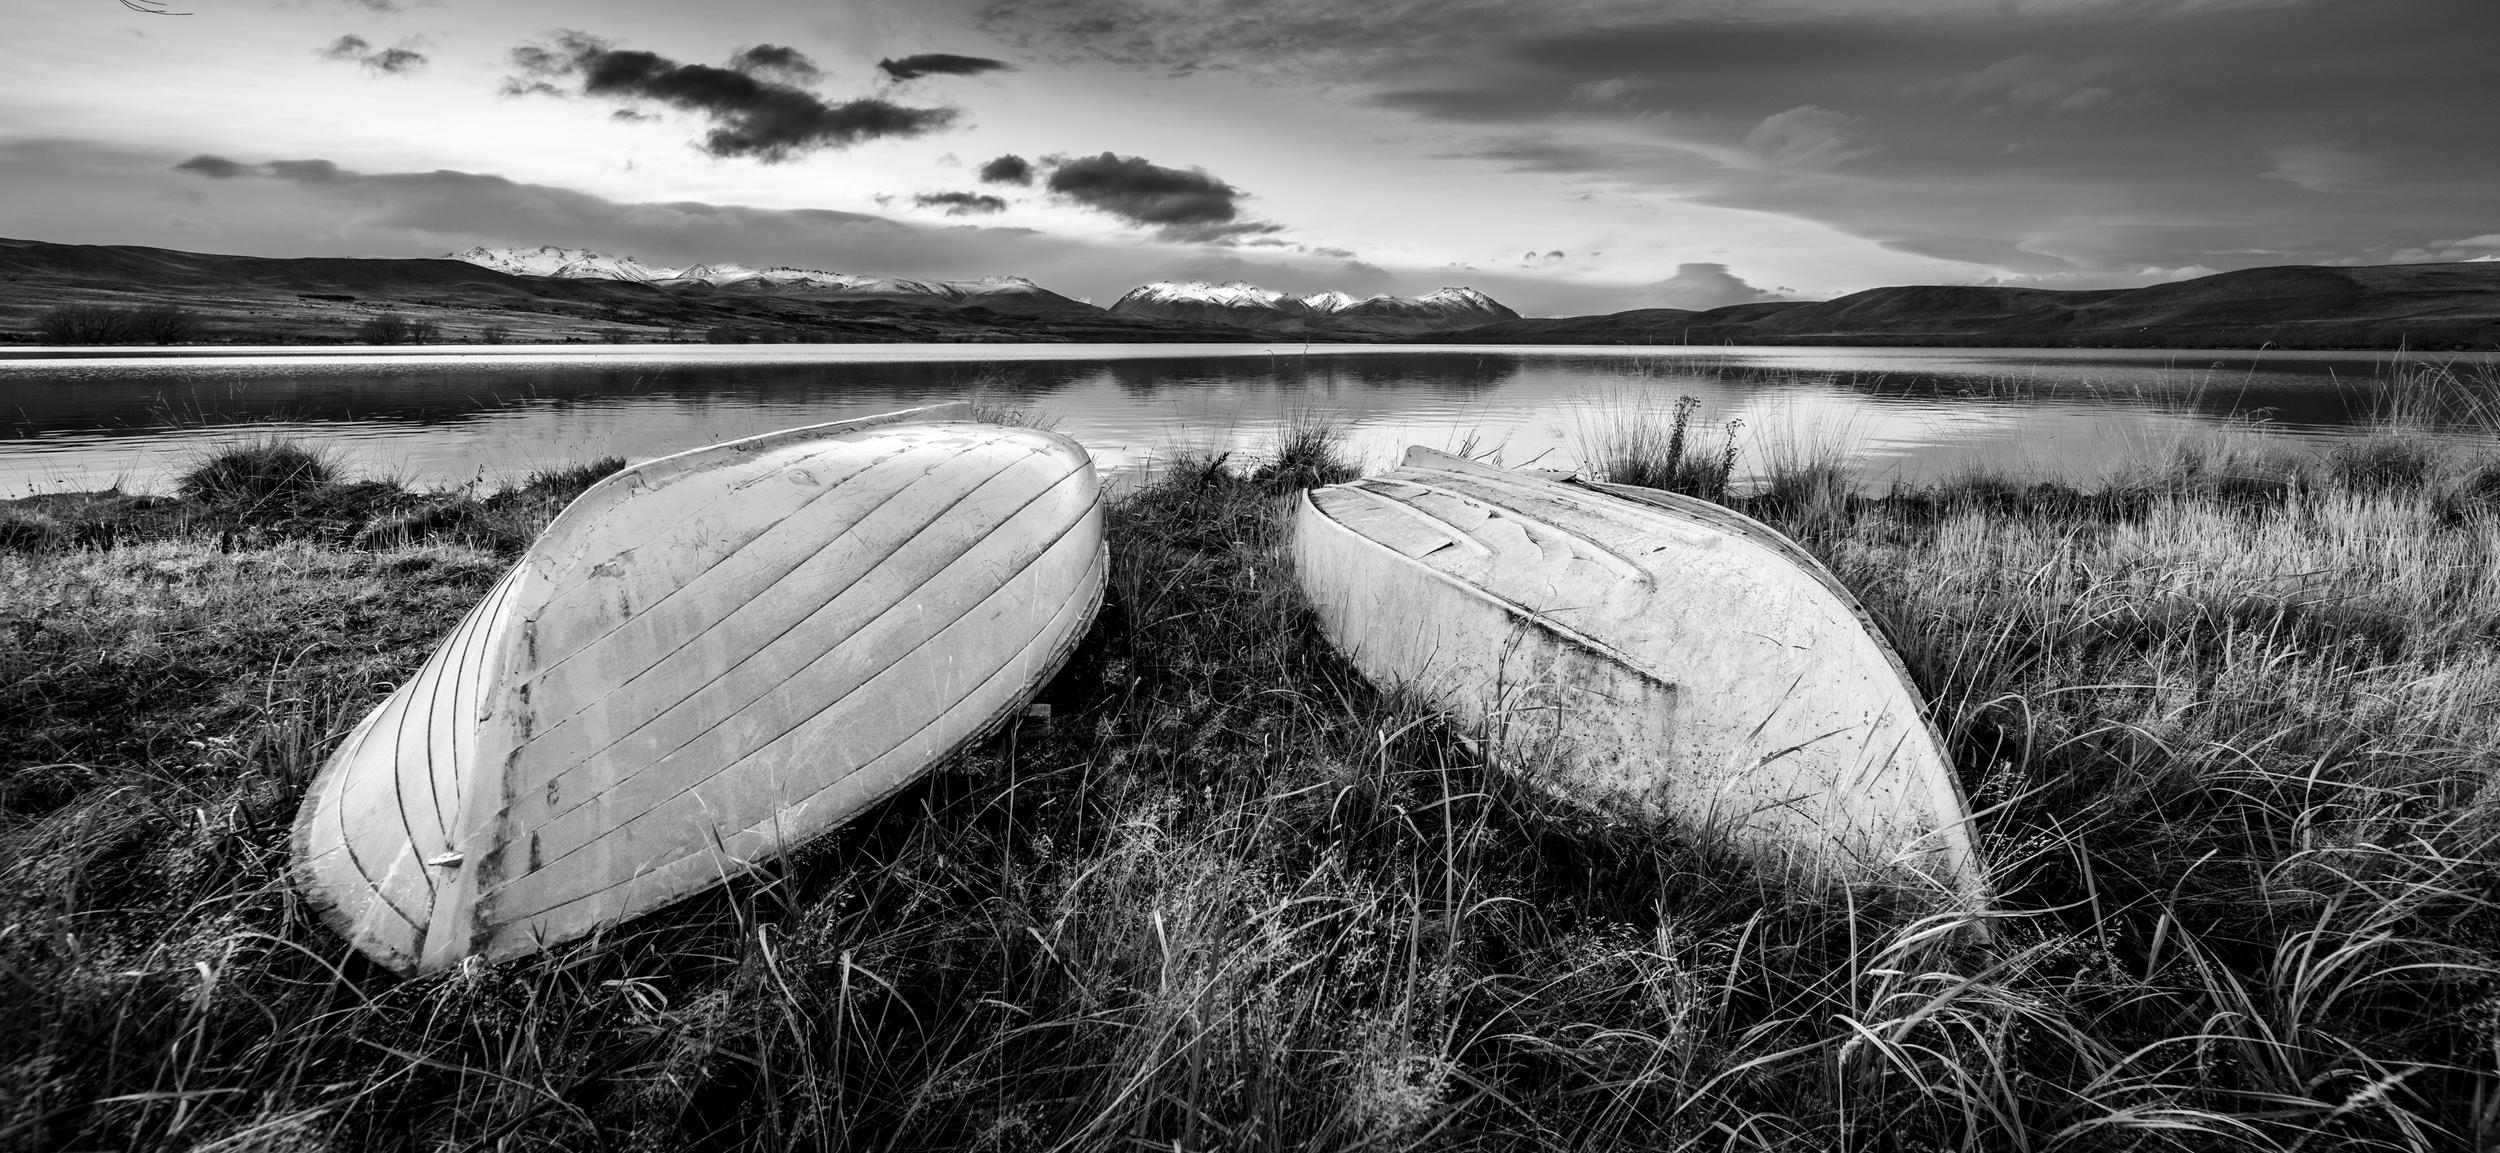 """Boat Race""  Lake Alexandrina, Mackenzie Basin, New Zealand  D800, ISO200, 1/8sec, f8, 14mm"